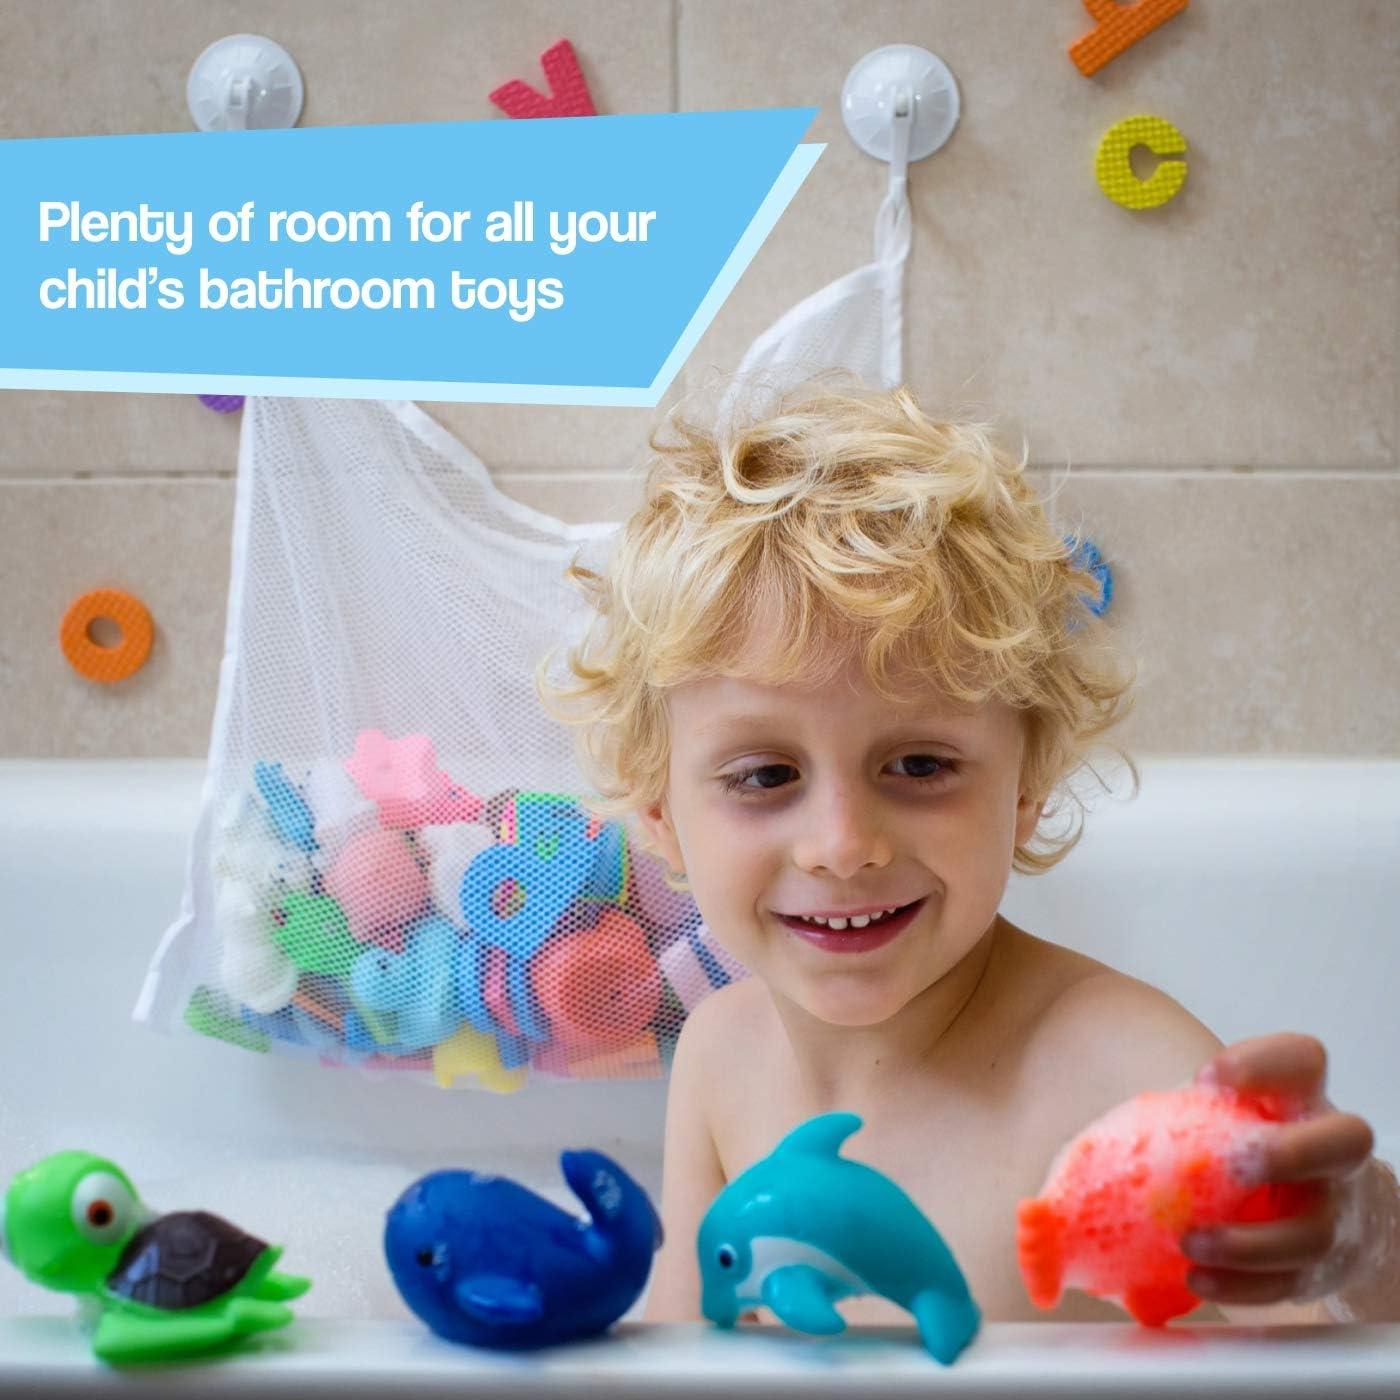 Blue COSY ANGEL Baby Bath Toy Bag for Bath Toys Large Organiser Bathroom Storage Net with 4 Waterproof Self Adhesive Hooks